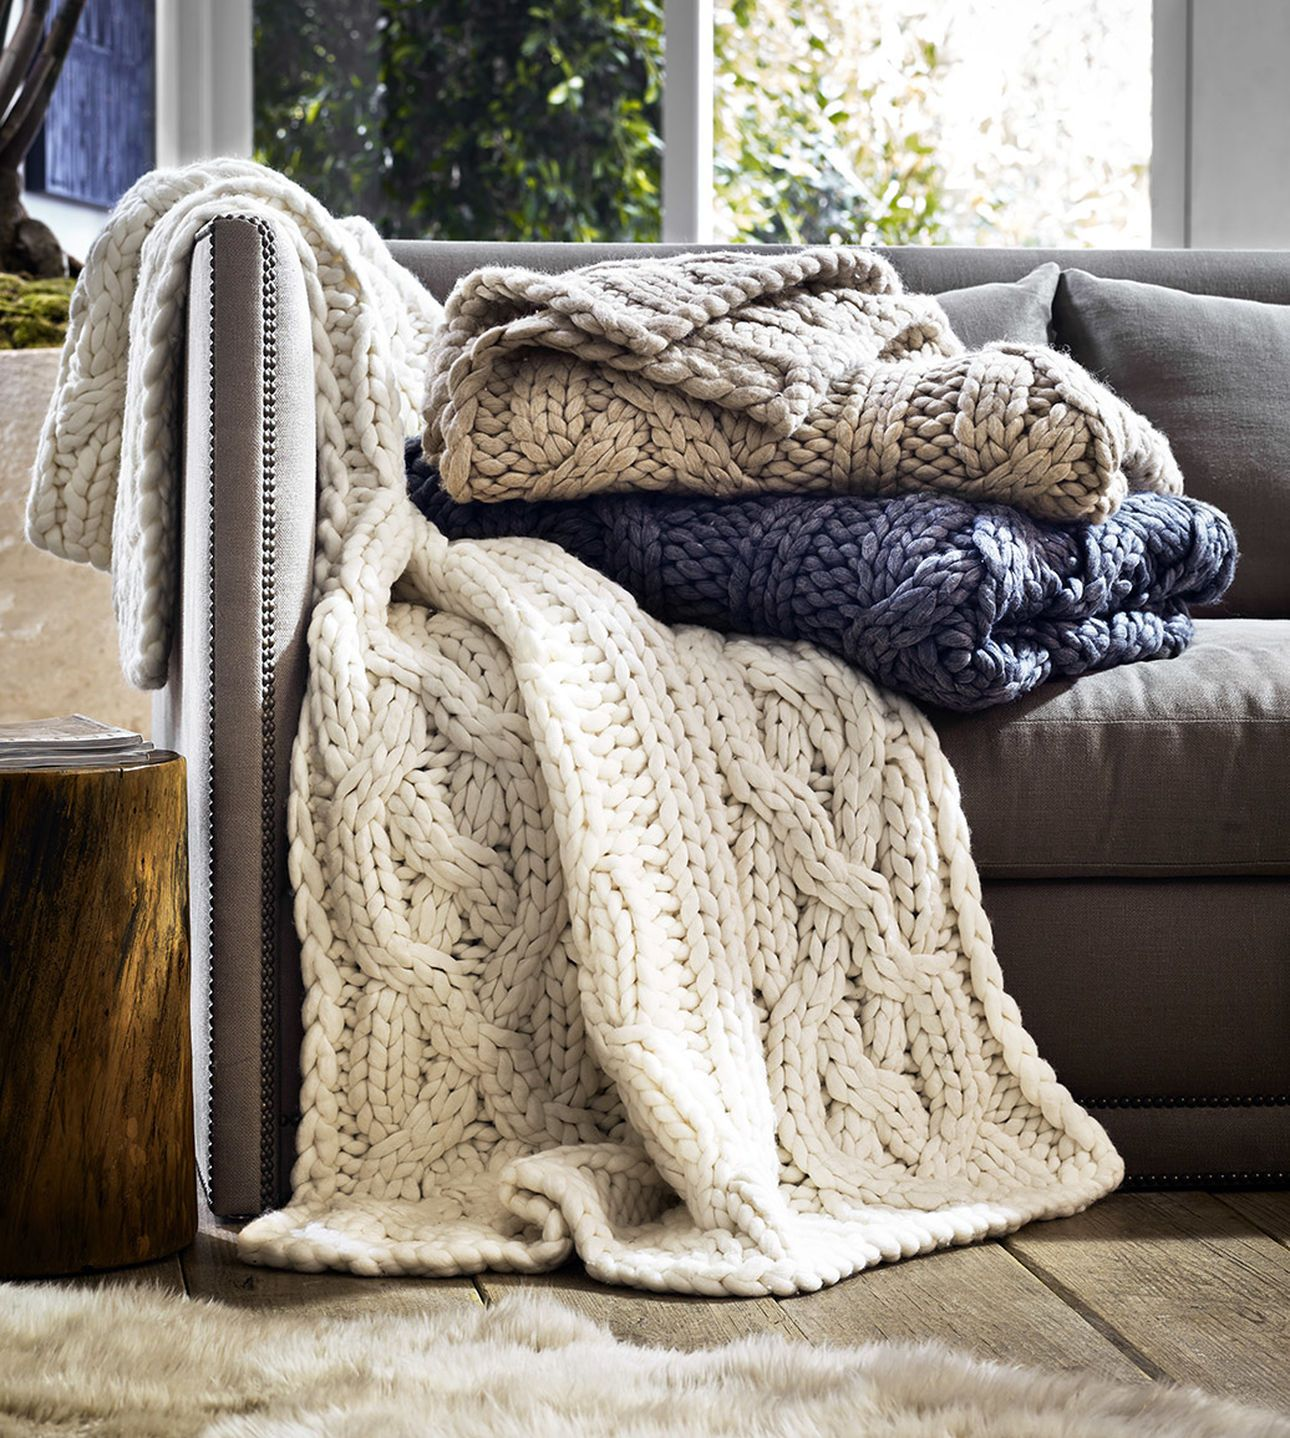 Oversized Knit Blanket 50x70 Oversize Knit Blanket Knitted Blankets Large Knit Blanket